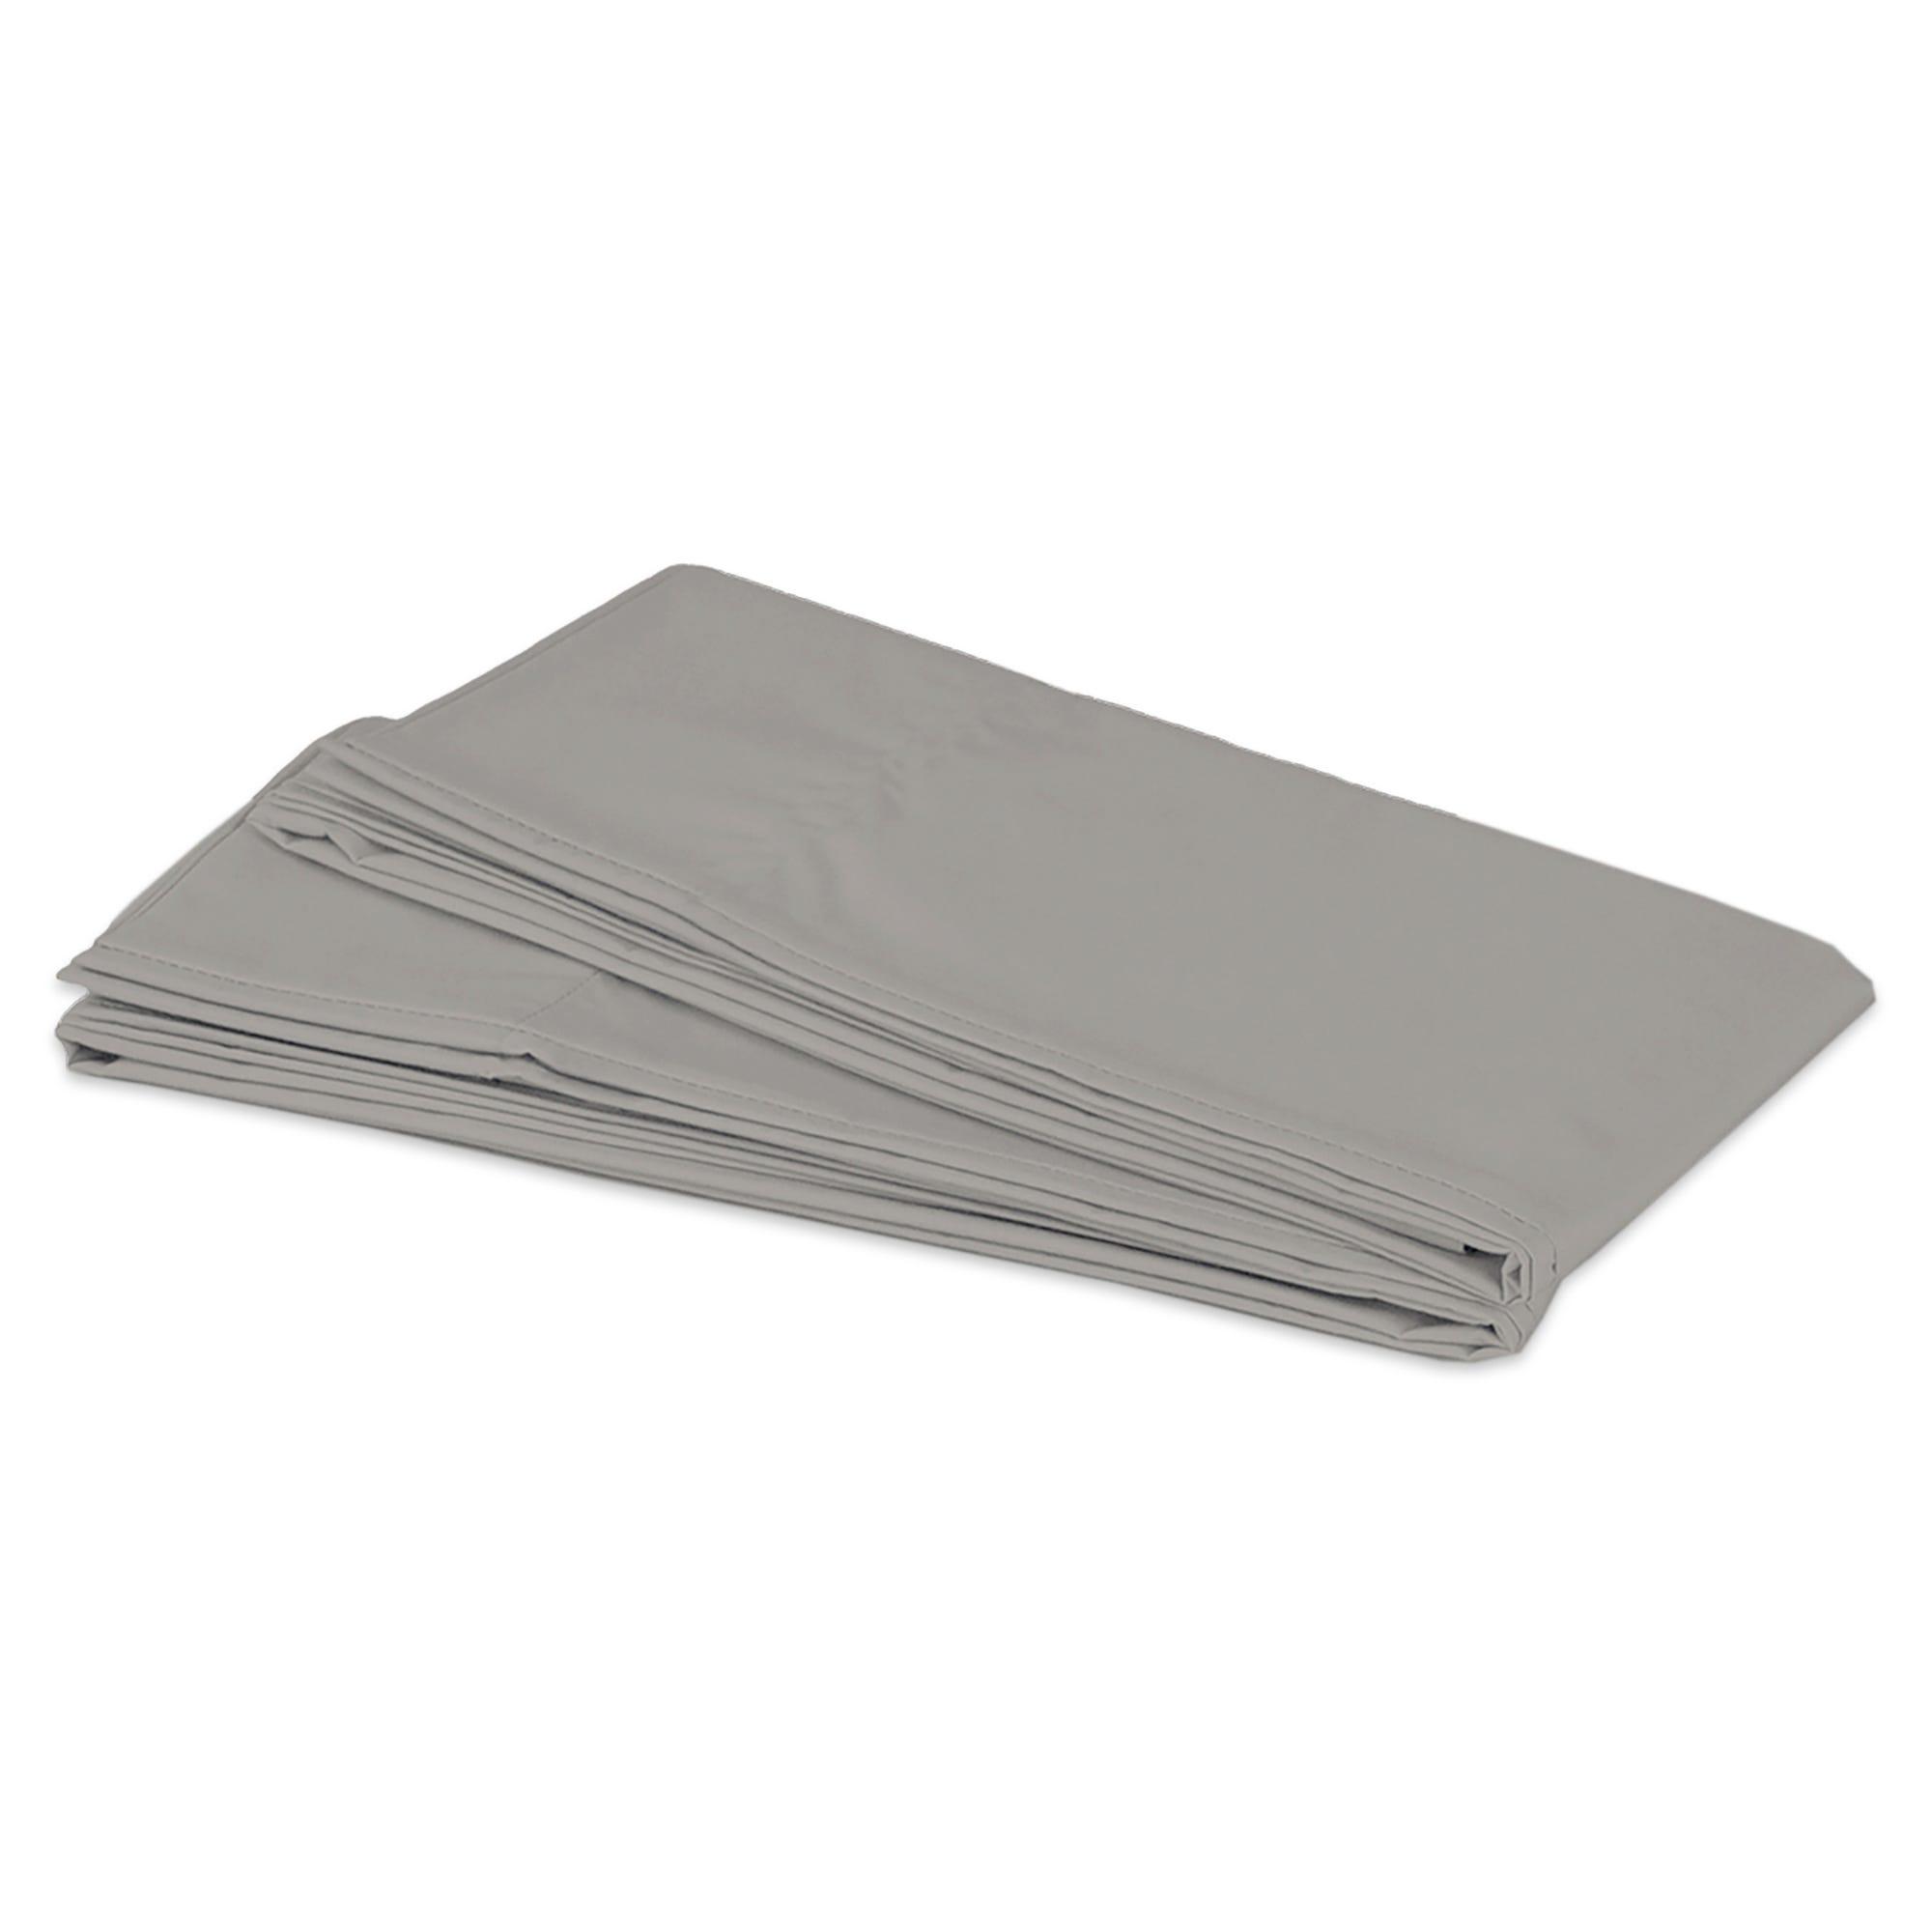 Fundas estándar de microfibra para almohadas Spring Air® color gris claro, Set de 2 piezas